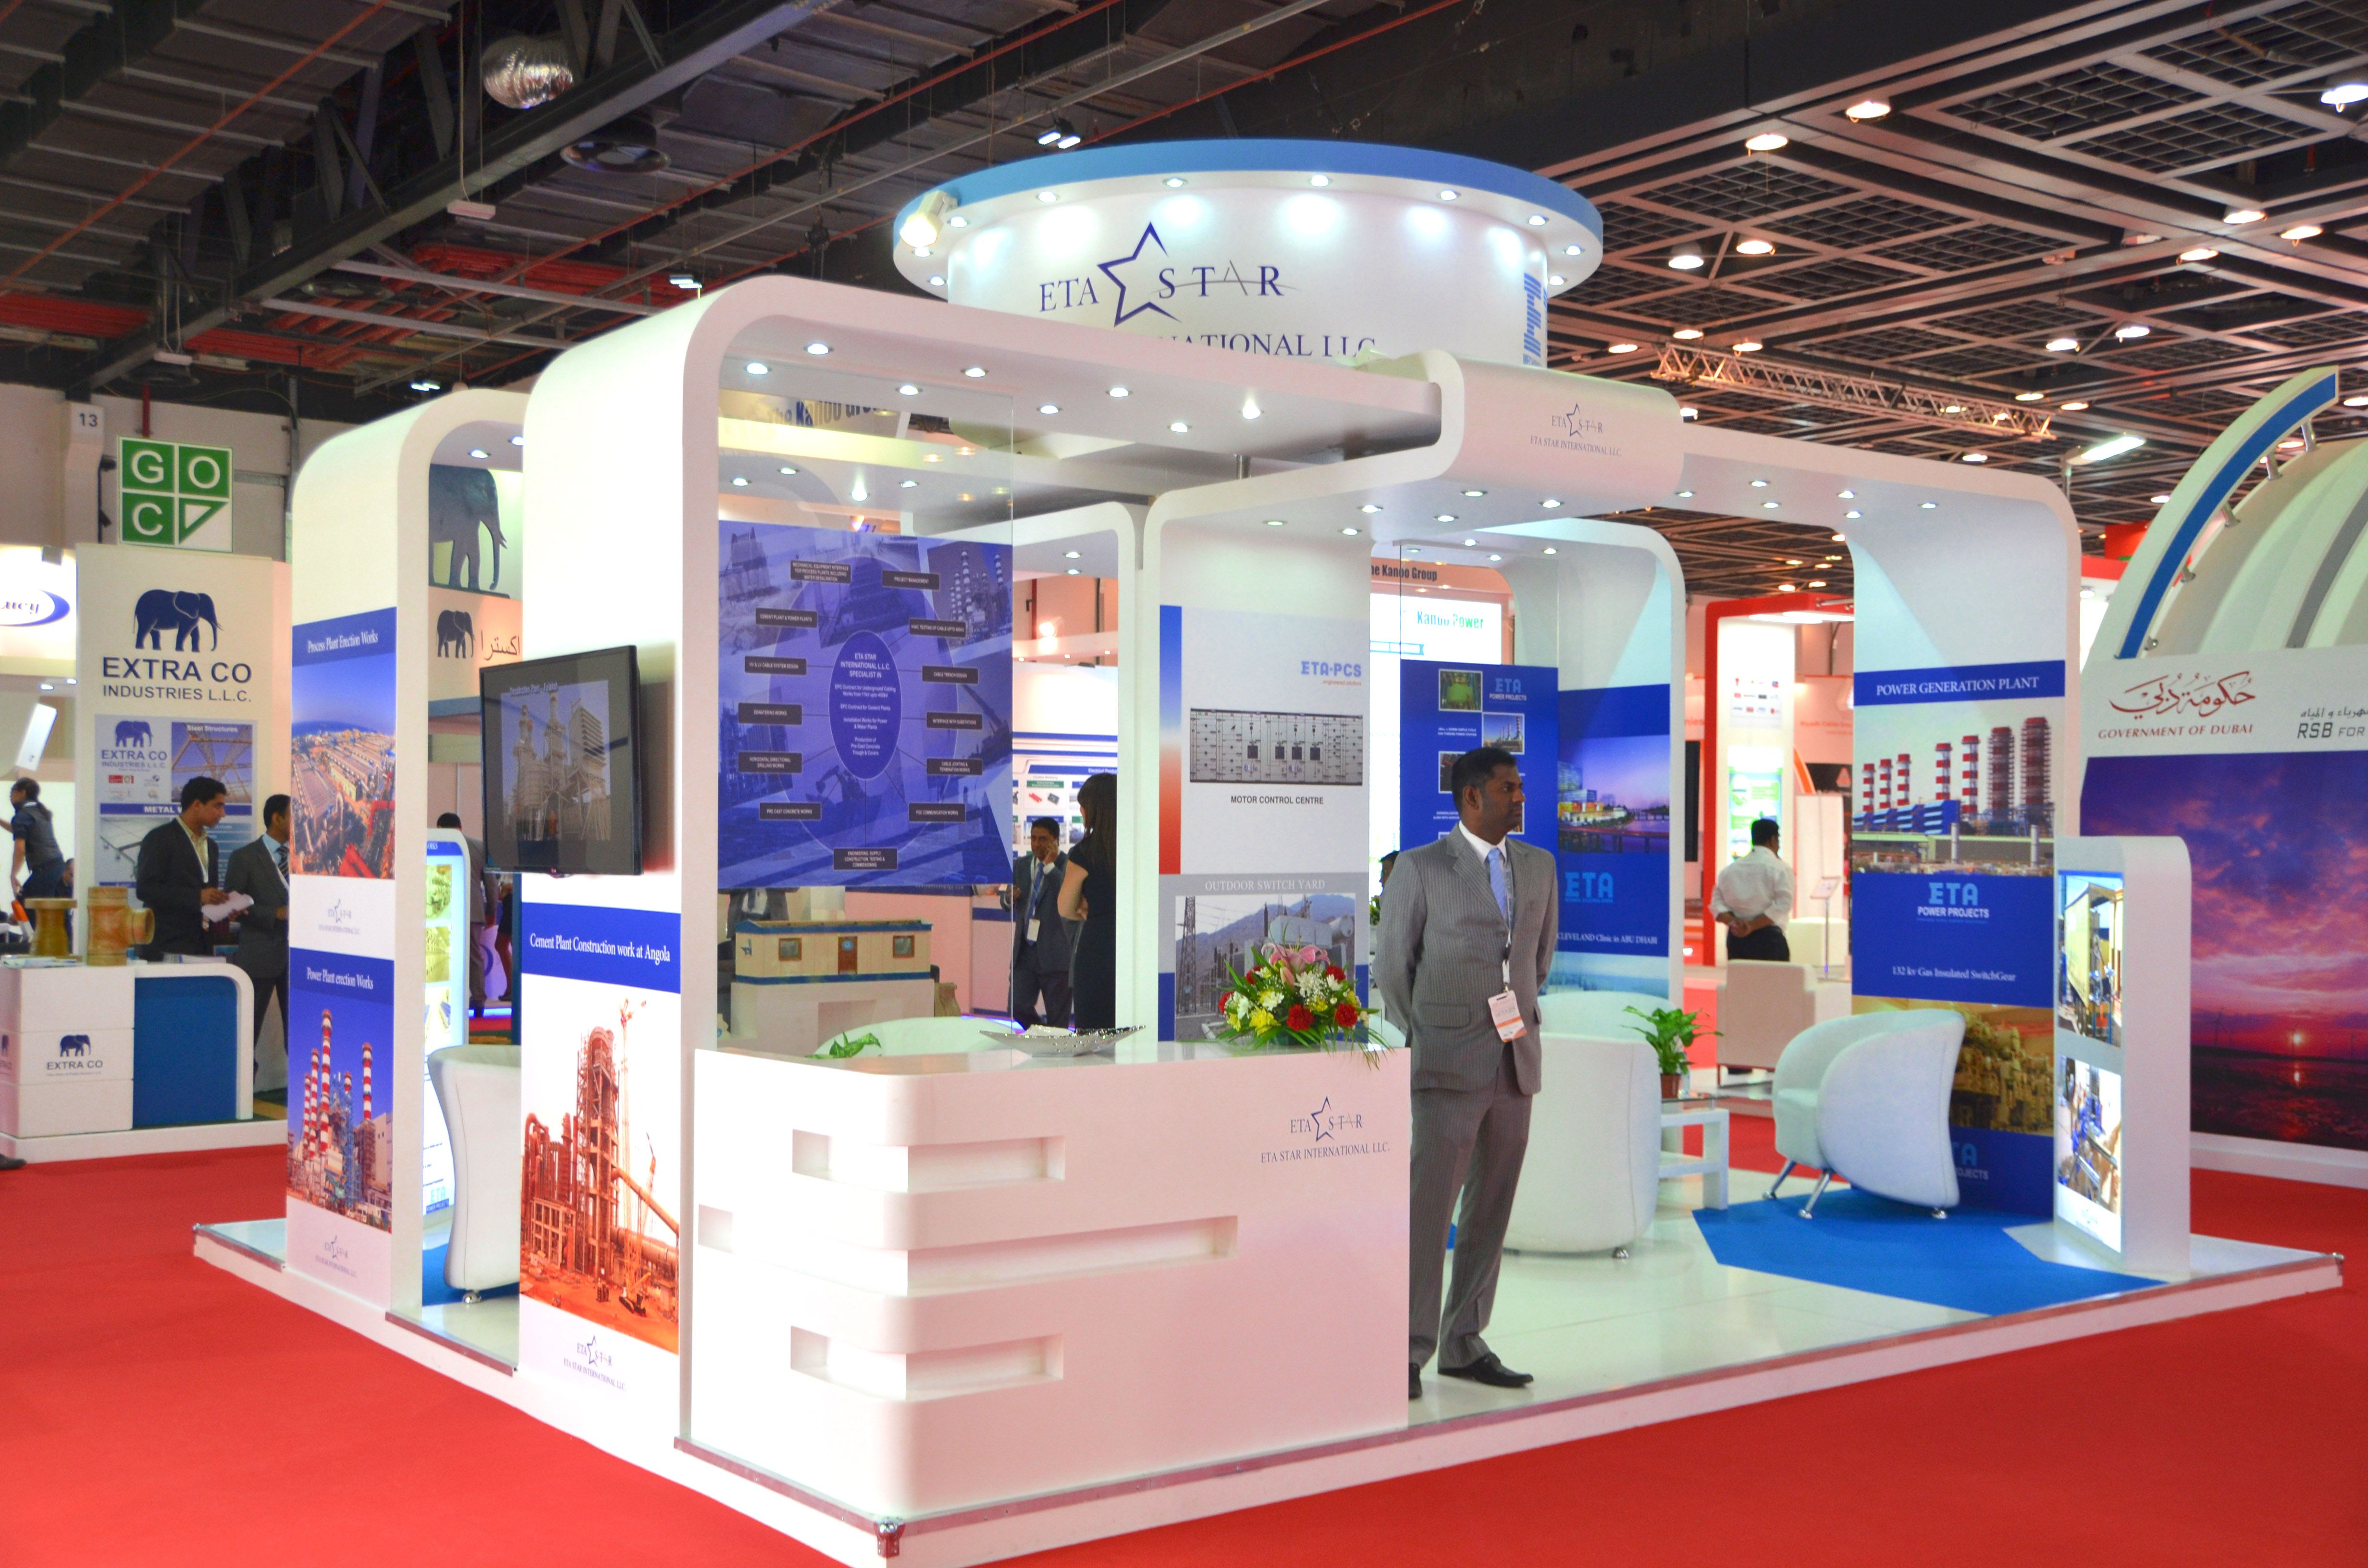 Exhibition Stand Design Best Practice : Witex exhibition stands uae stand design